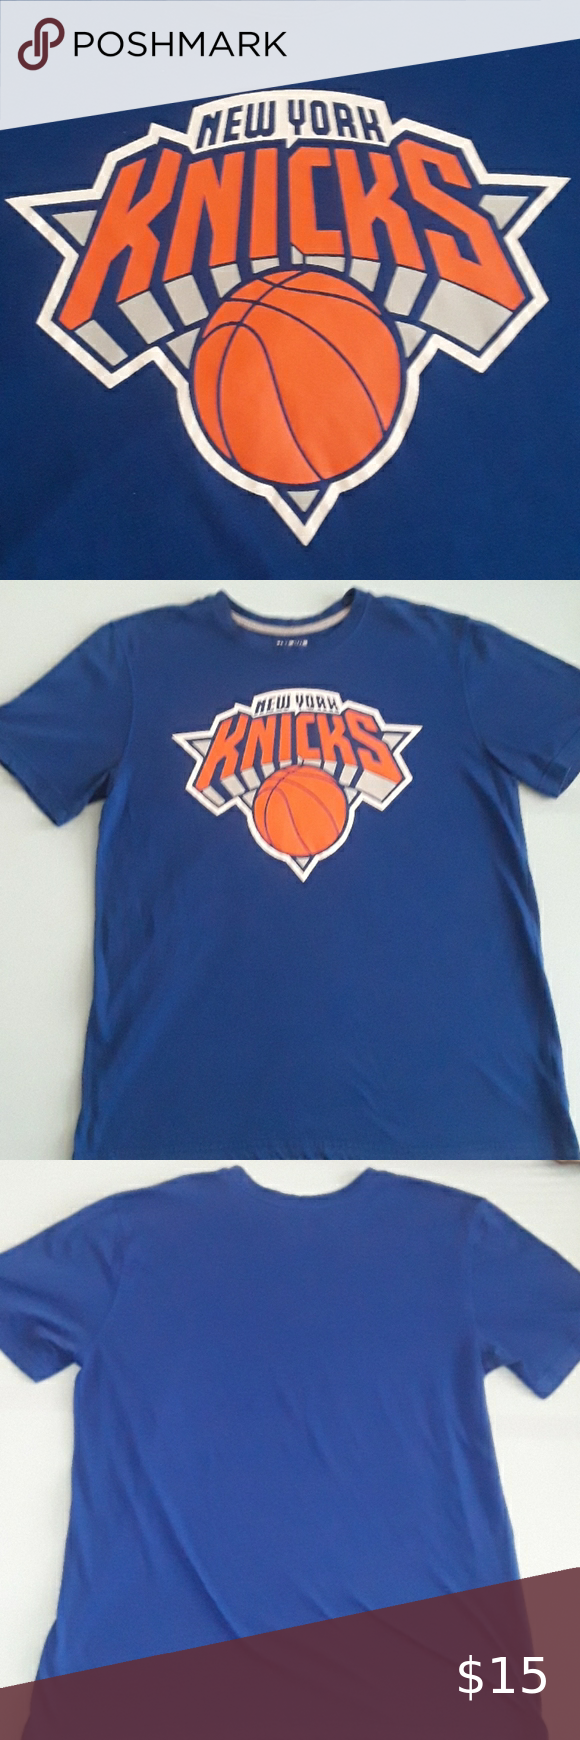 Ny Knicks Vintage Tee Vintage Nba T Shirt New York Knicks Large Great Condition Nba Shirts Tees Short Sleeve In 2020 Nba T Shirts Vintage Tees Ny Knicks